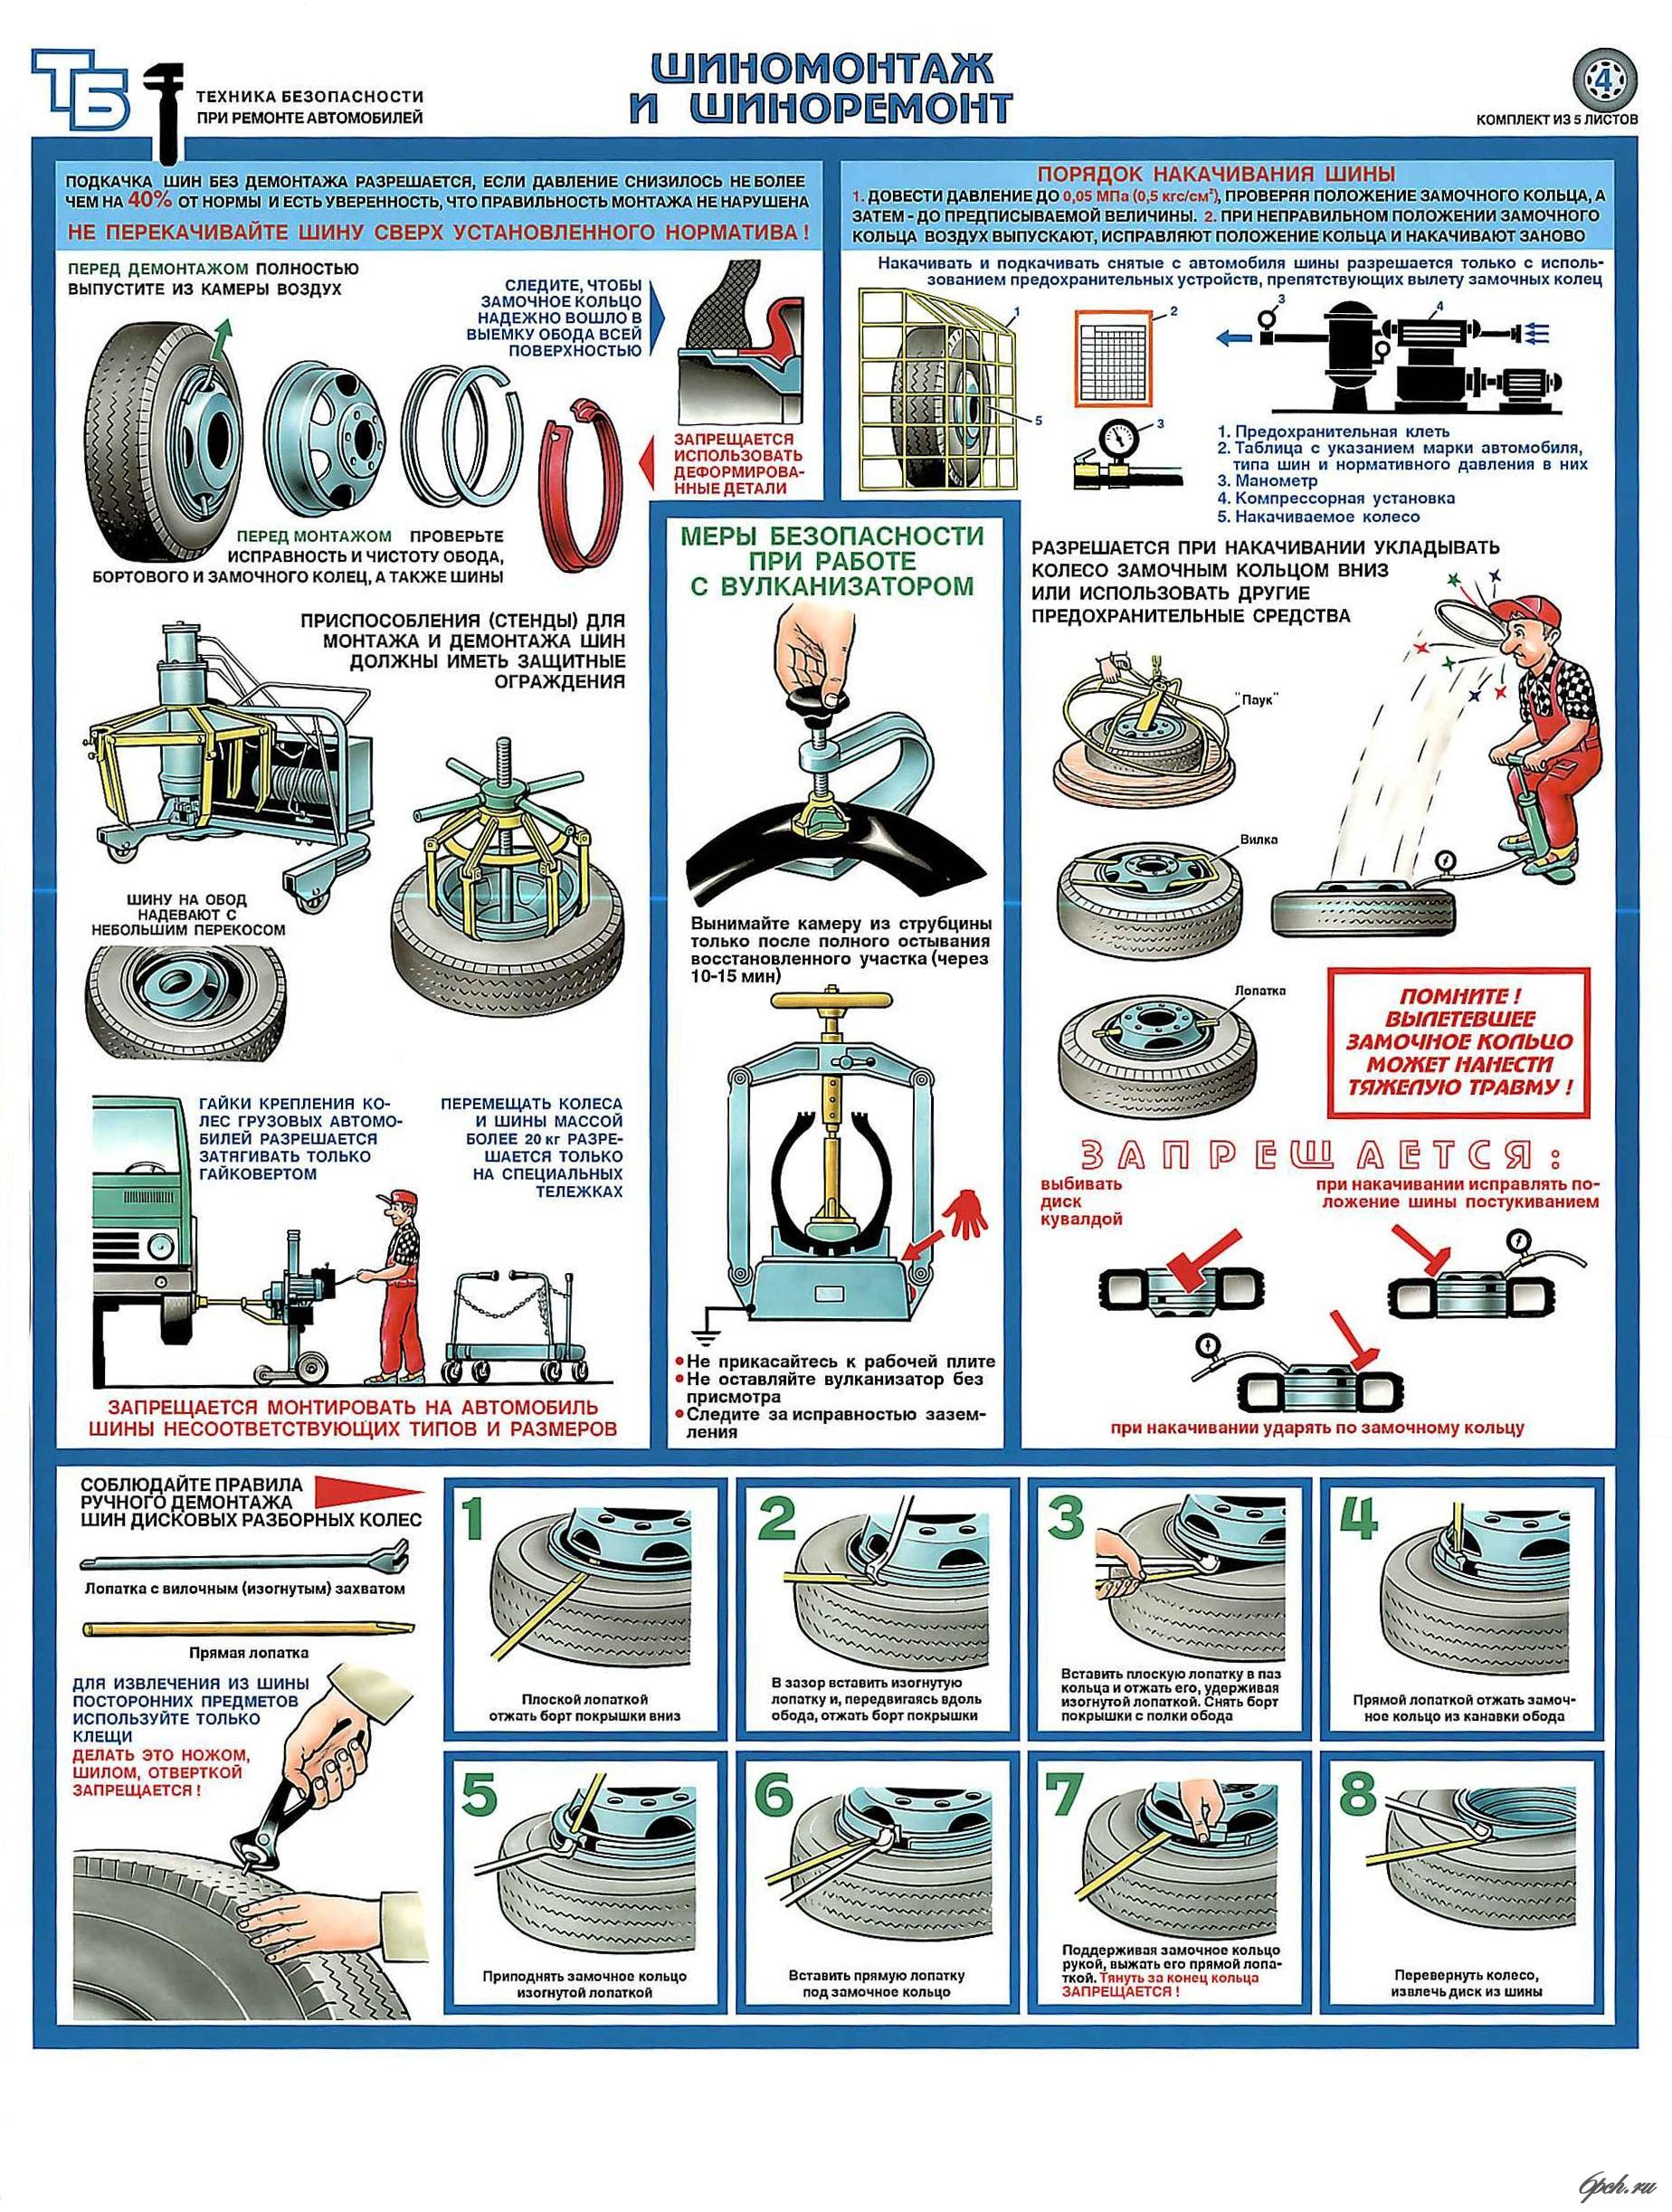 Инструкция по охране при снятии и установке колес автомобиля